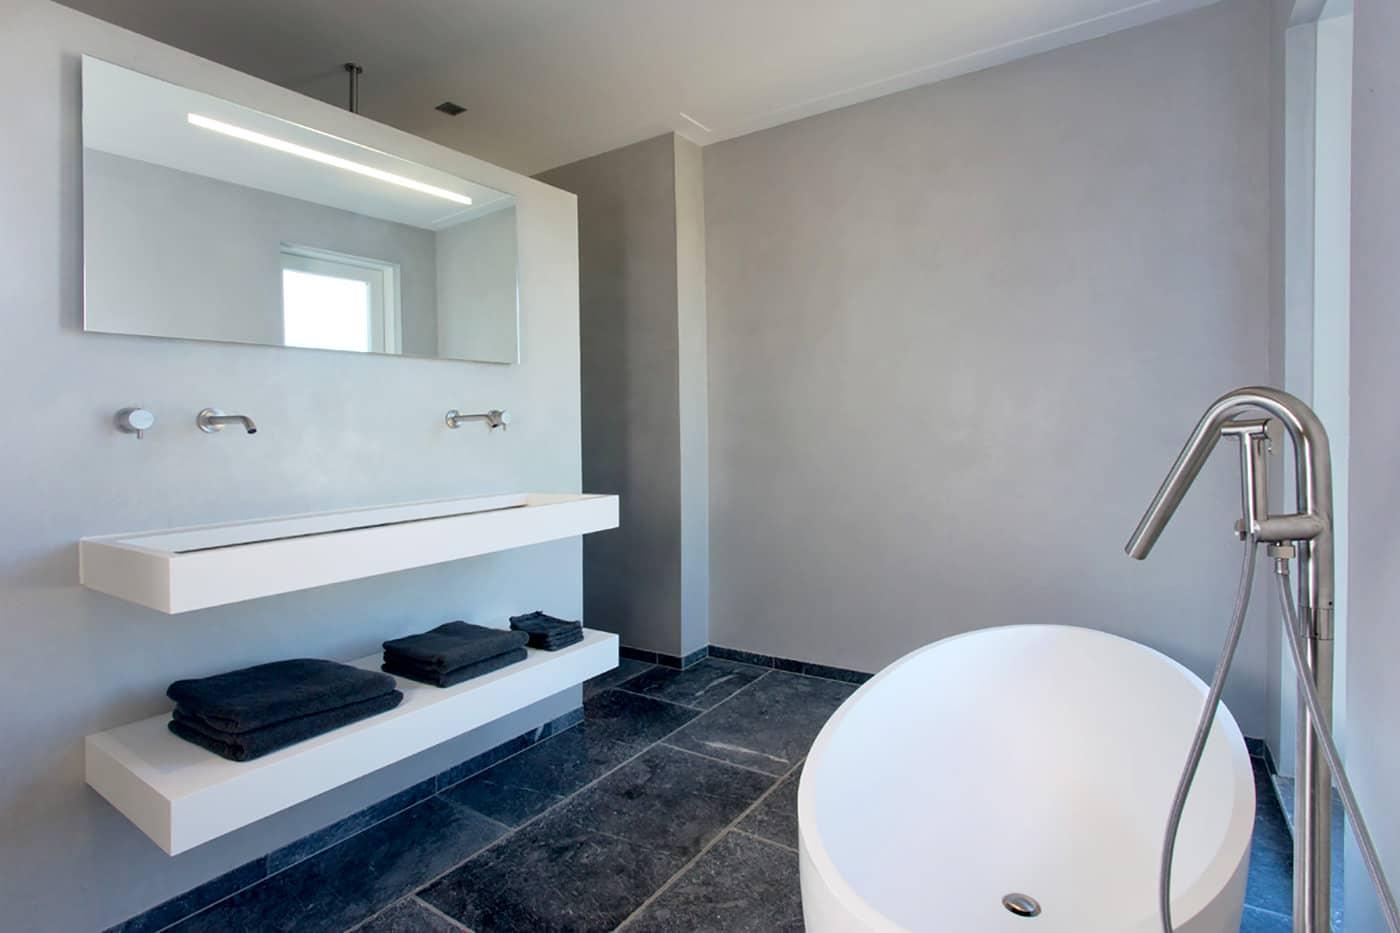 cocoon-hotel-bathroom-design-hotel-design-hotelrenovation-hotel-bathroom-design-products-hotel-architect